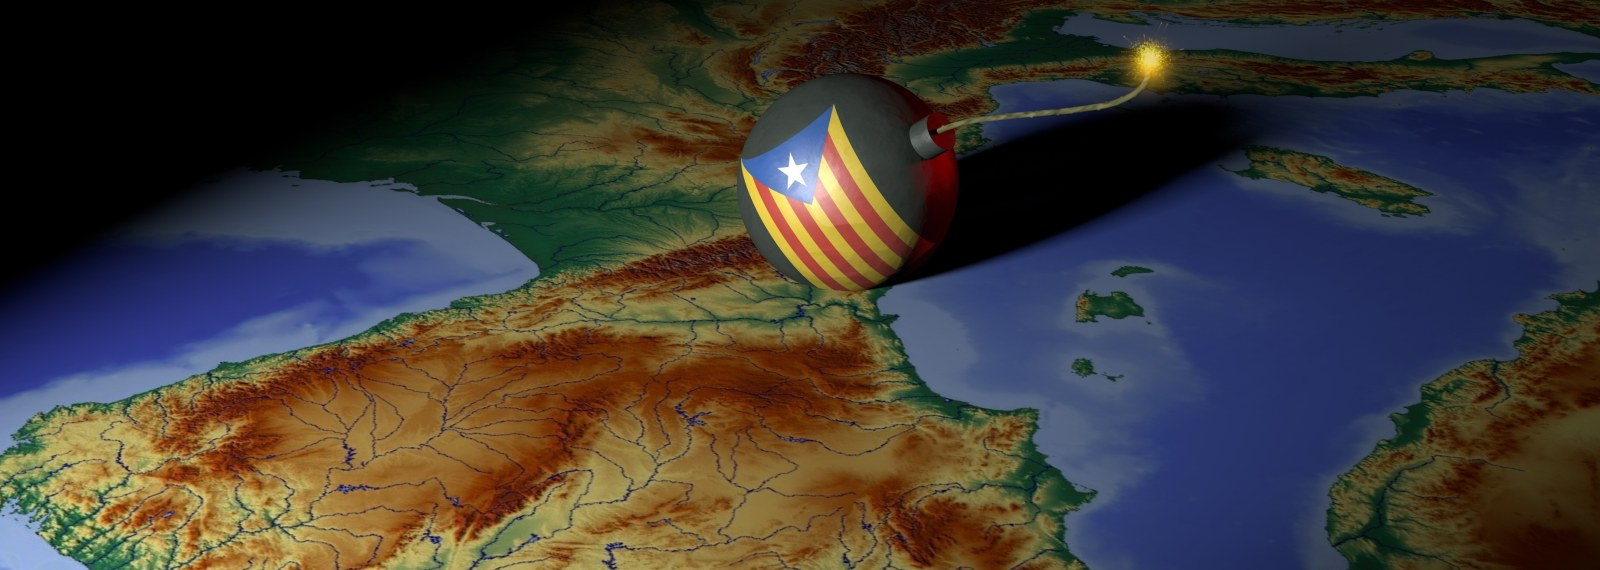 Katalonien Konflikt Verlierer